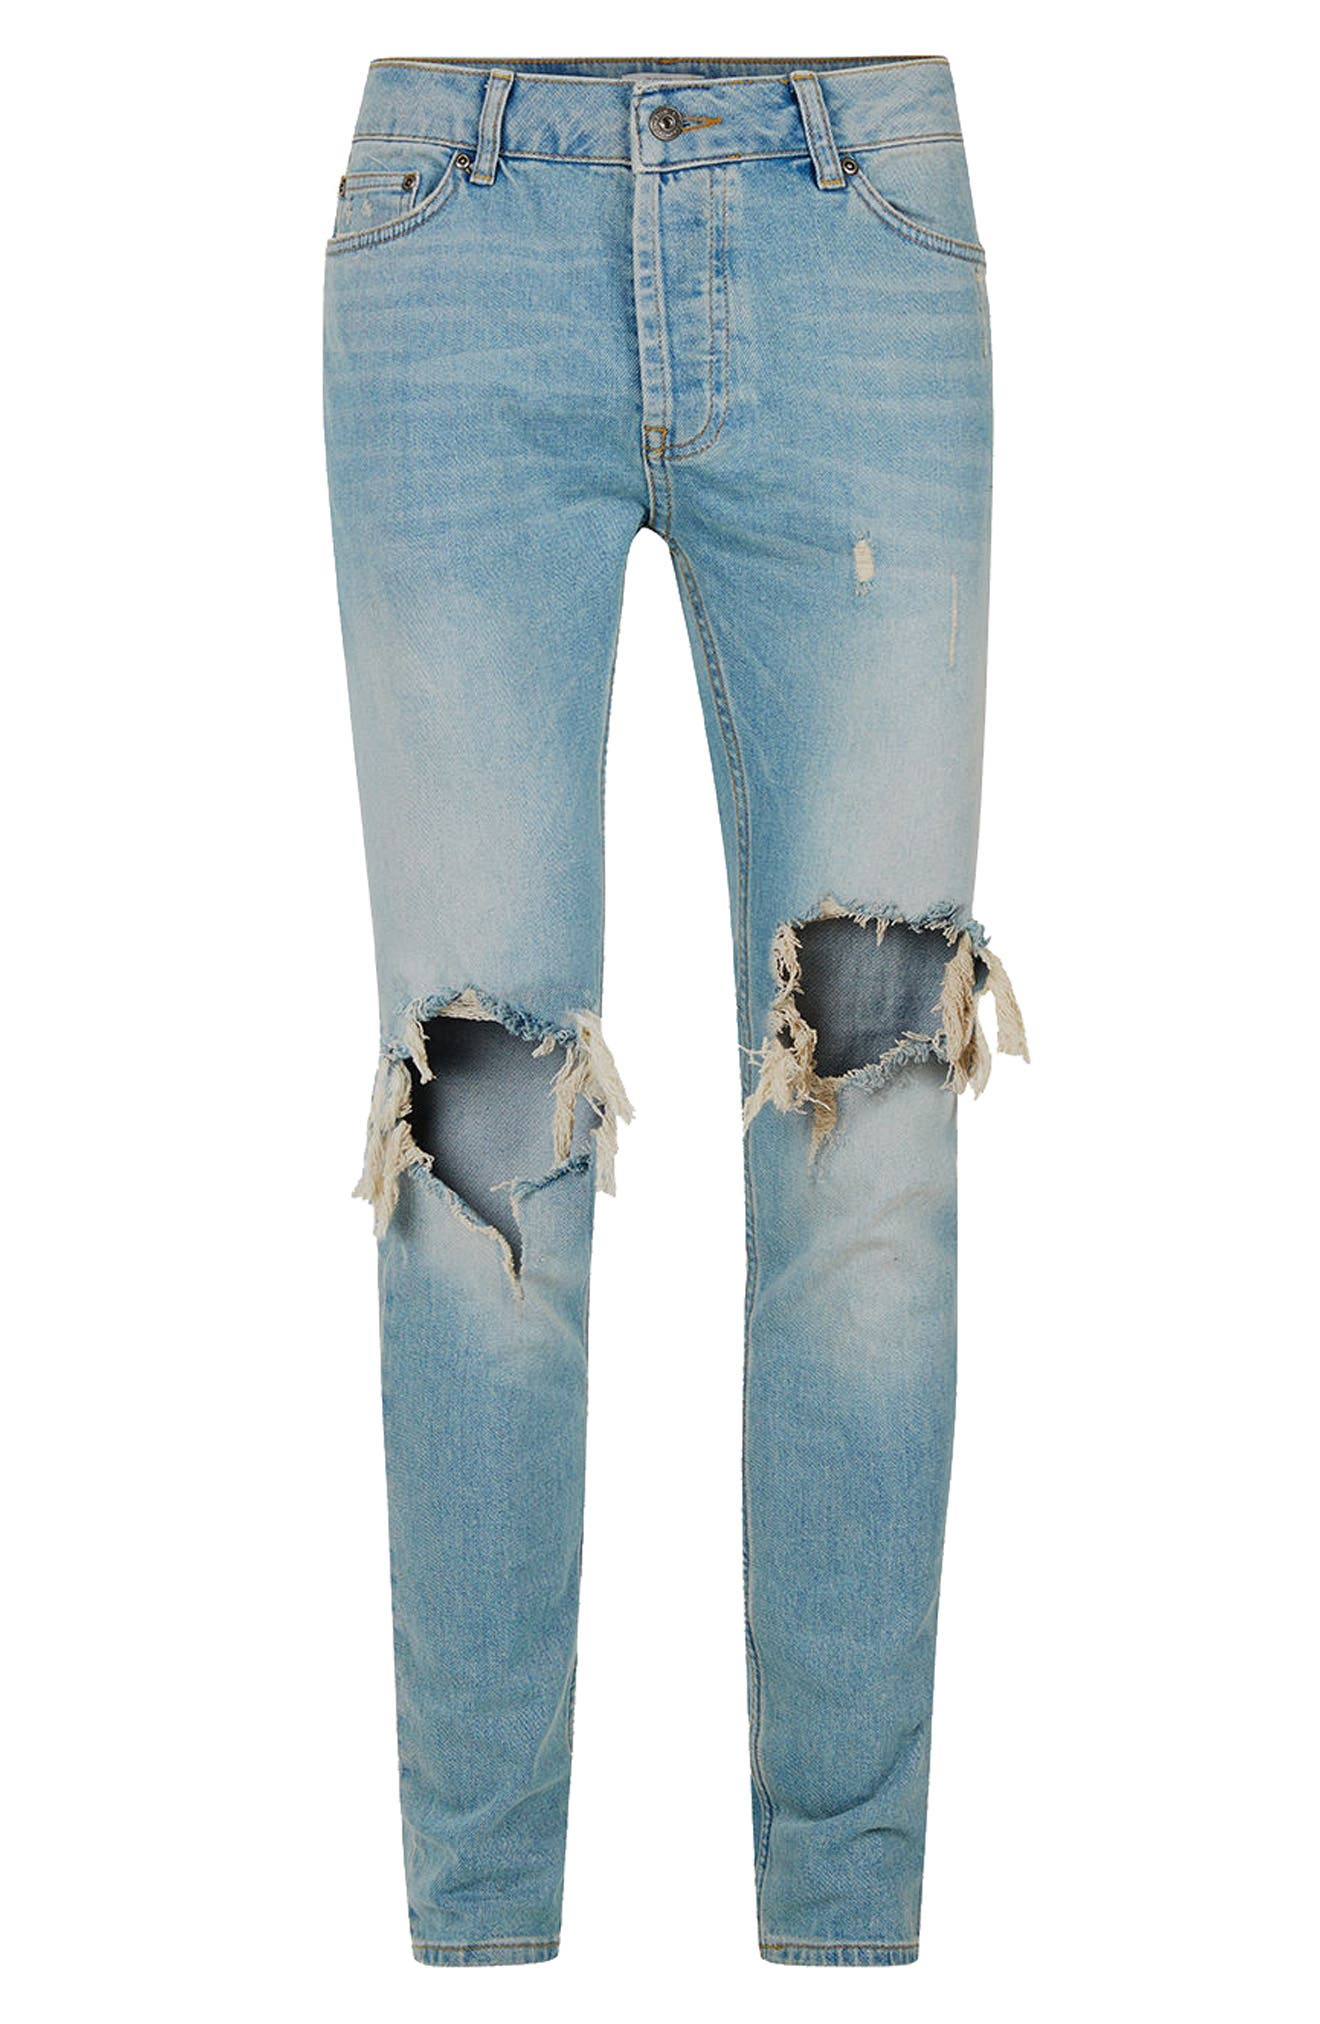 Ripped Stretch Skinny Jeans,                             Alternate thumbnail 6, color,                             LIGHT WASH DENIM